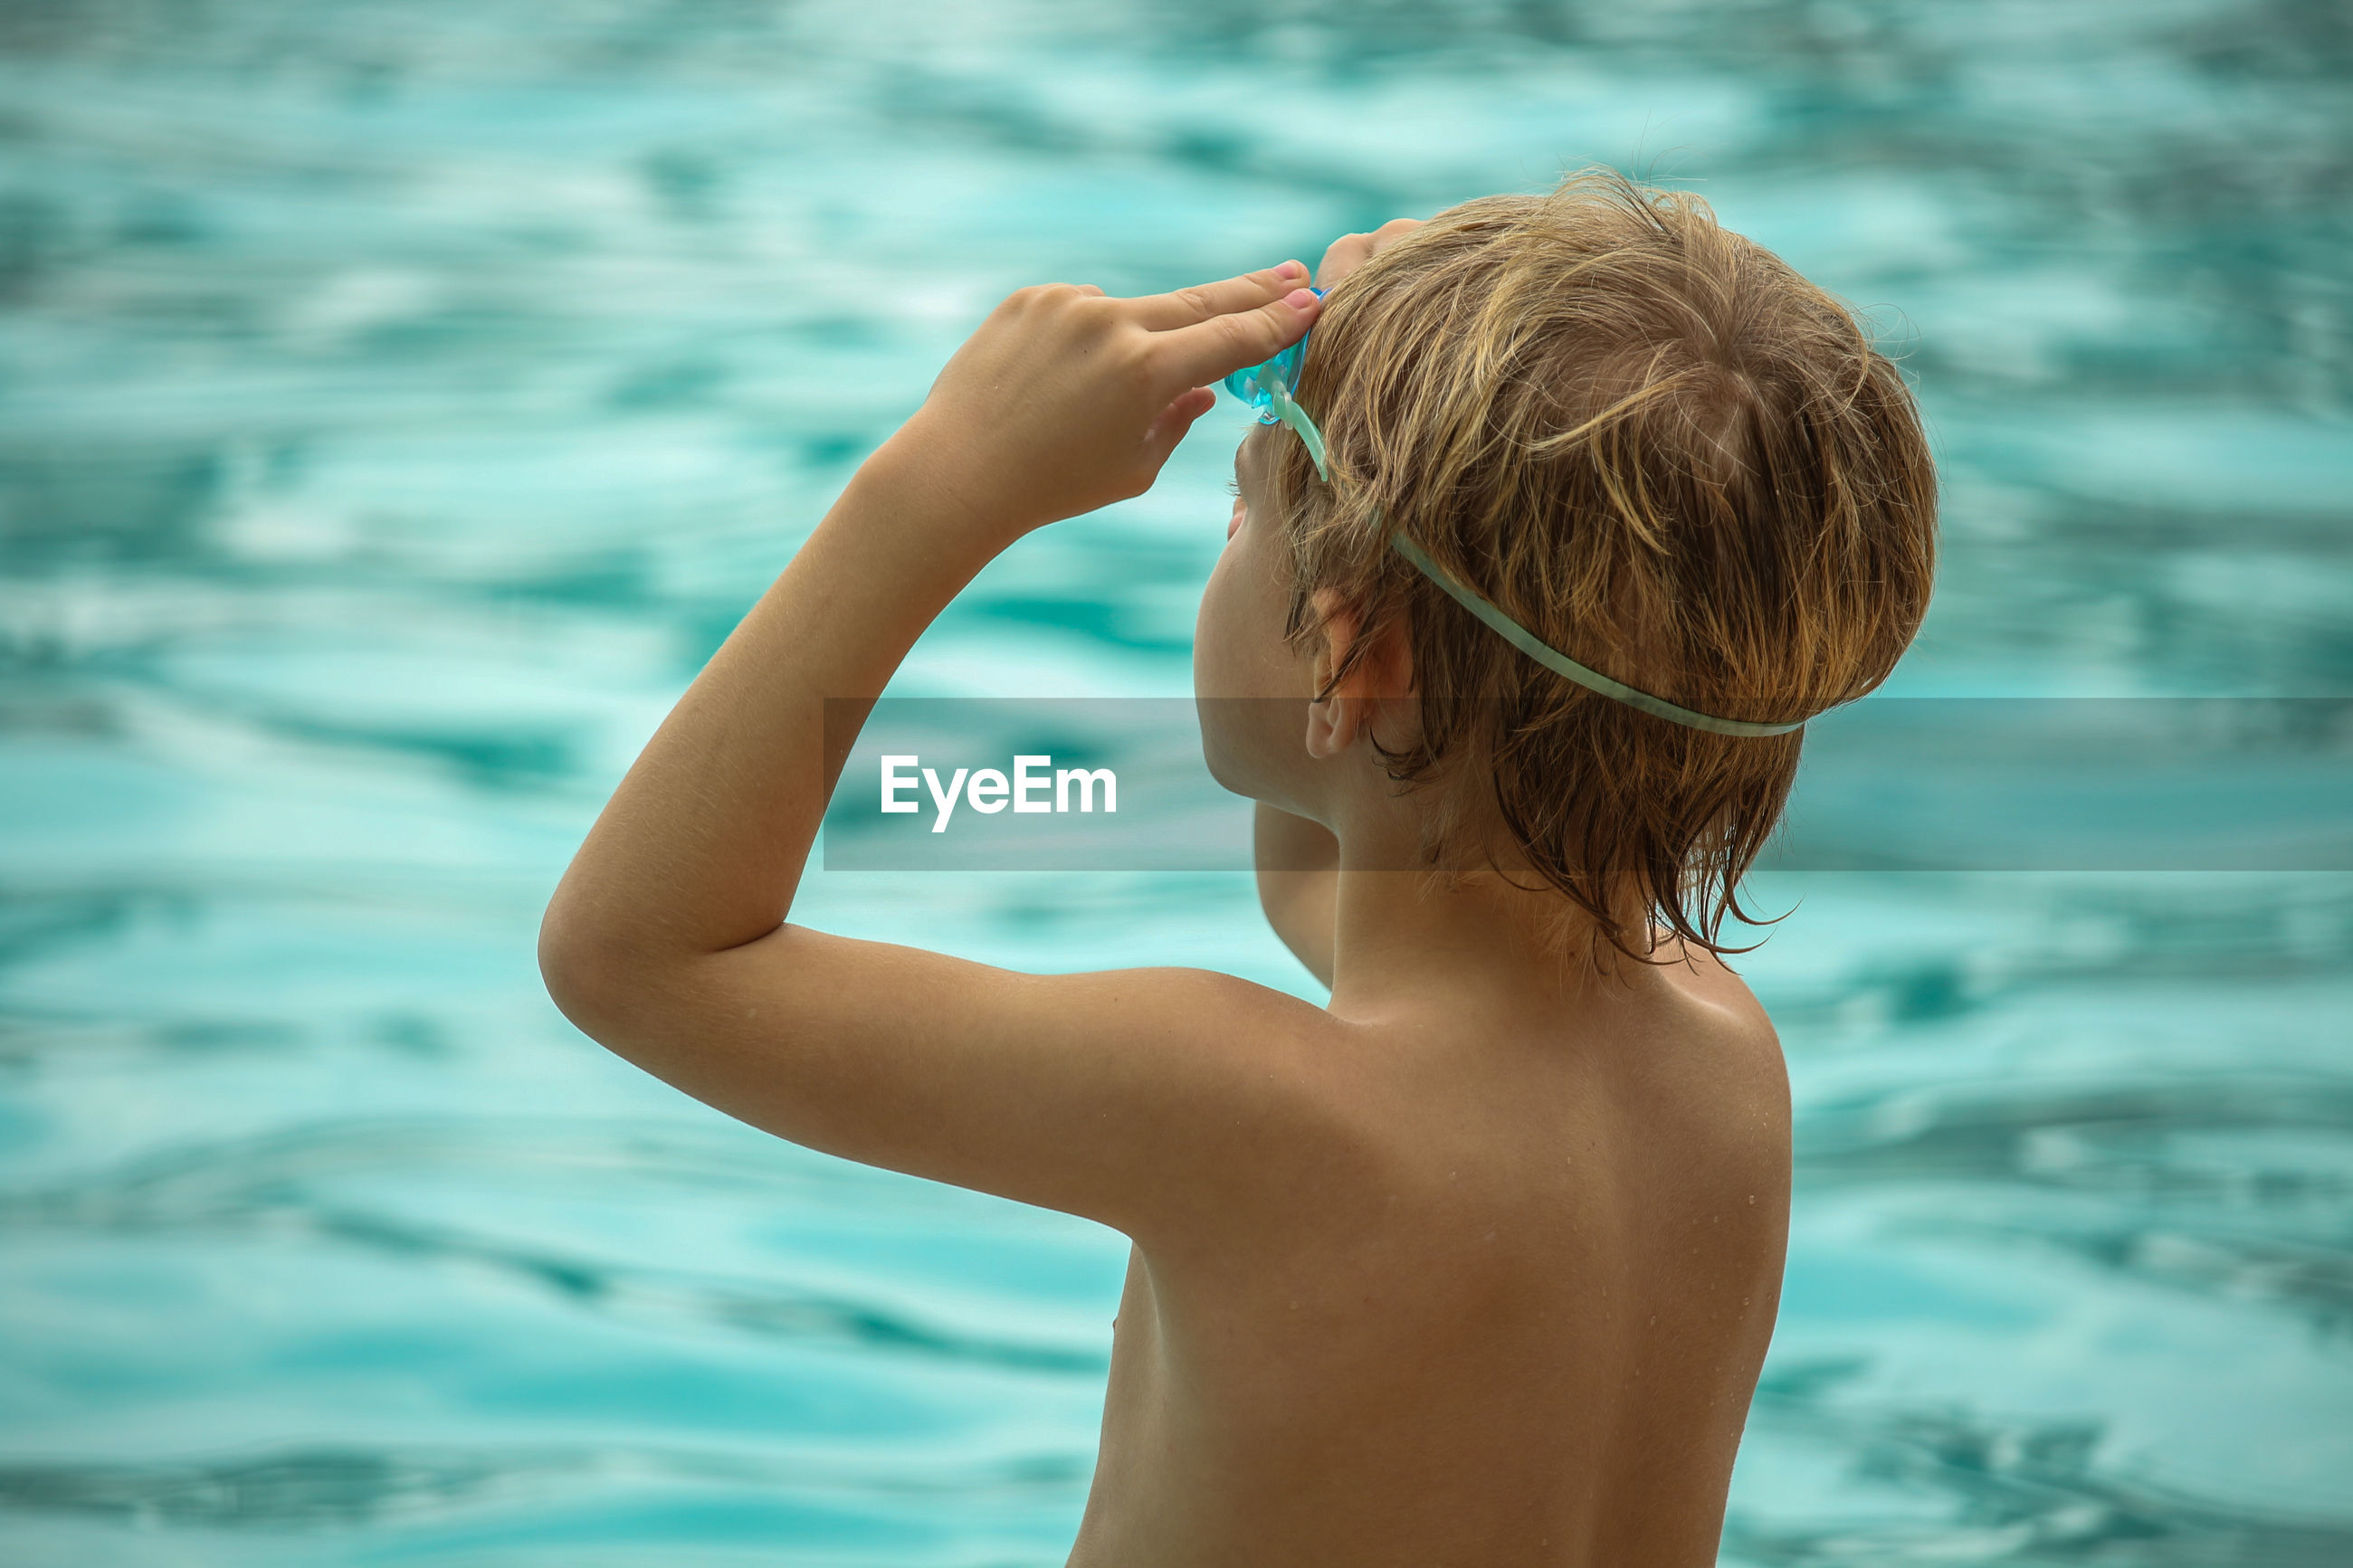 Shirtless boy wearing swimming goggles in sea